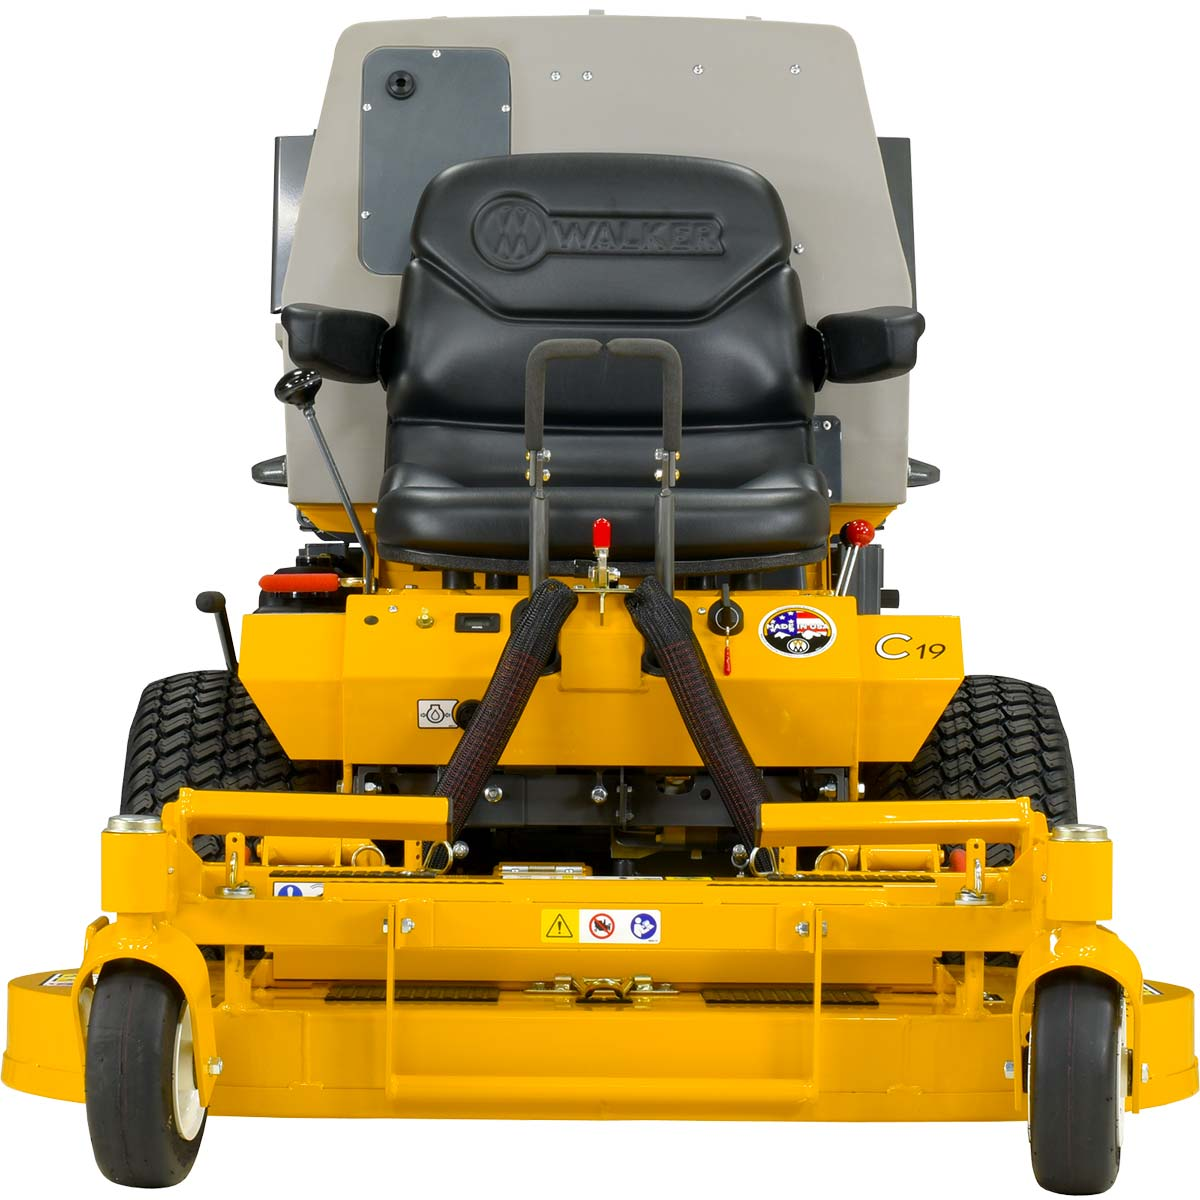 Walker MC19 mower - narrow profile for close landscape work